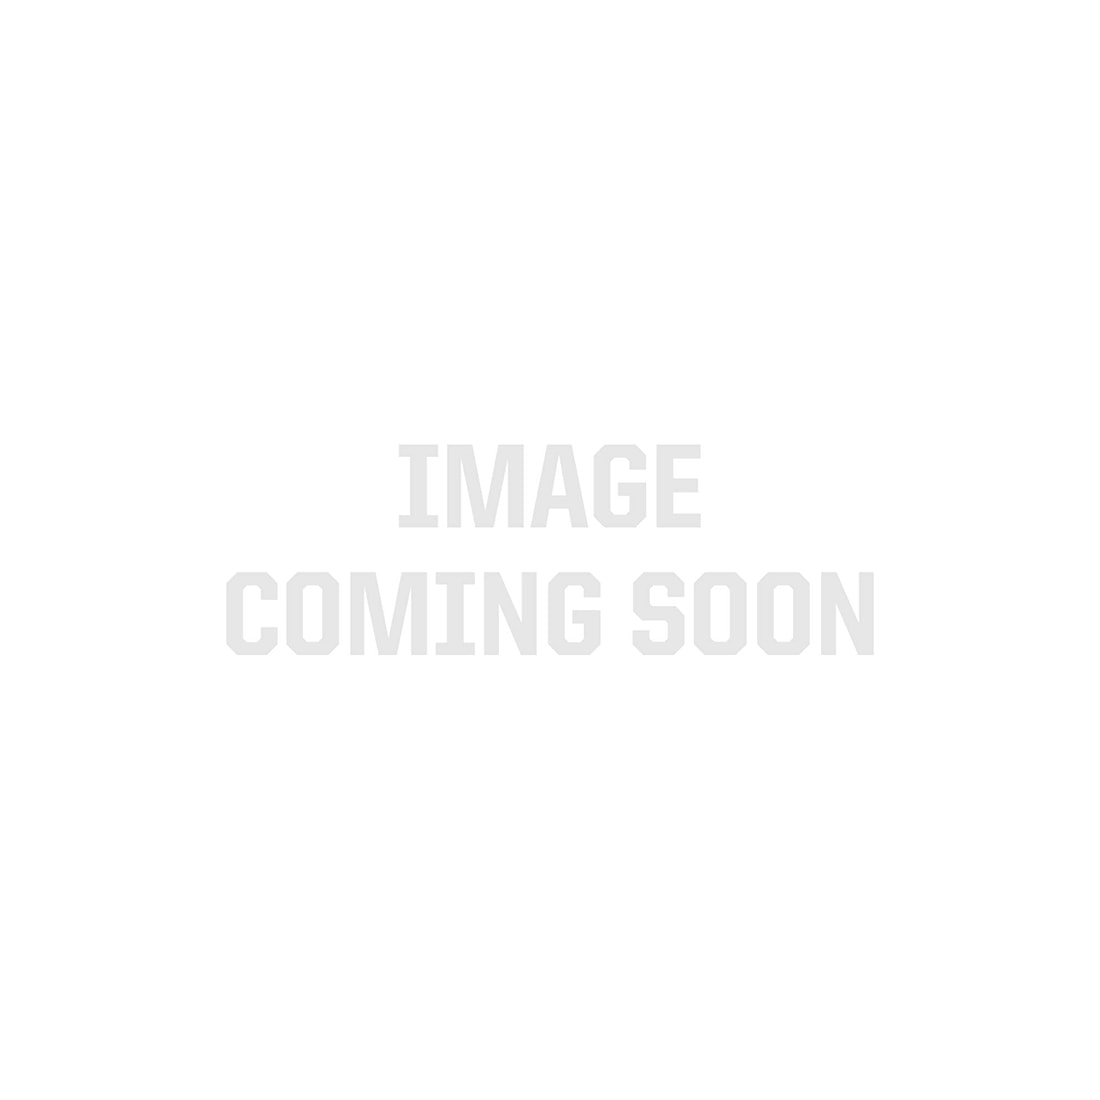 Kichler Design Pro LED 12.9 inch Hardscape Light Flat Mount Bracket (4-Pack)